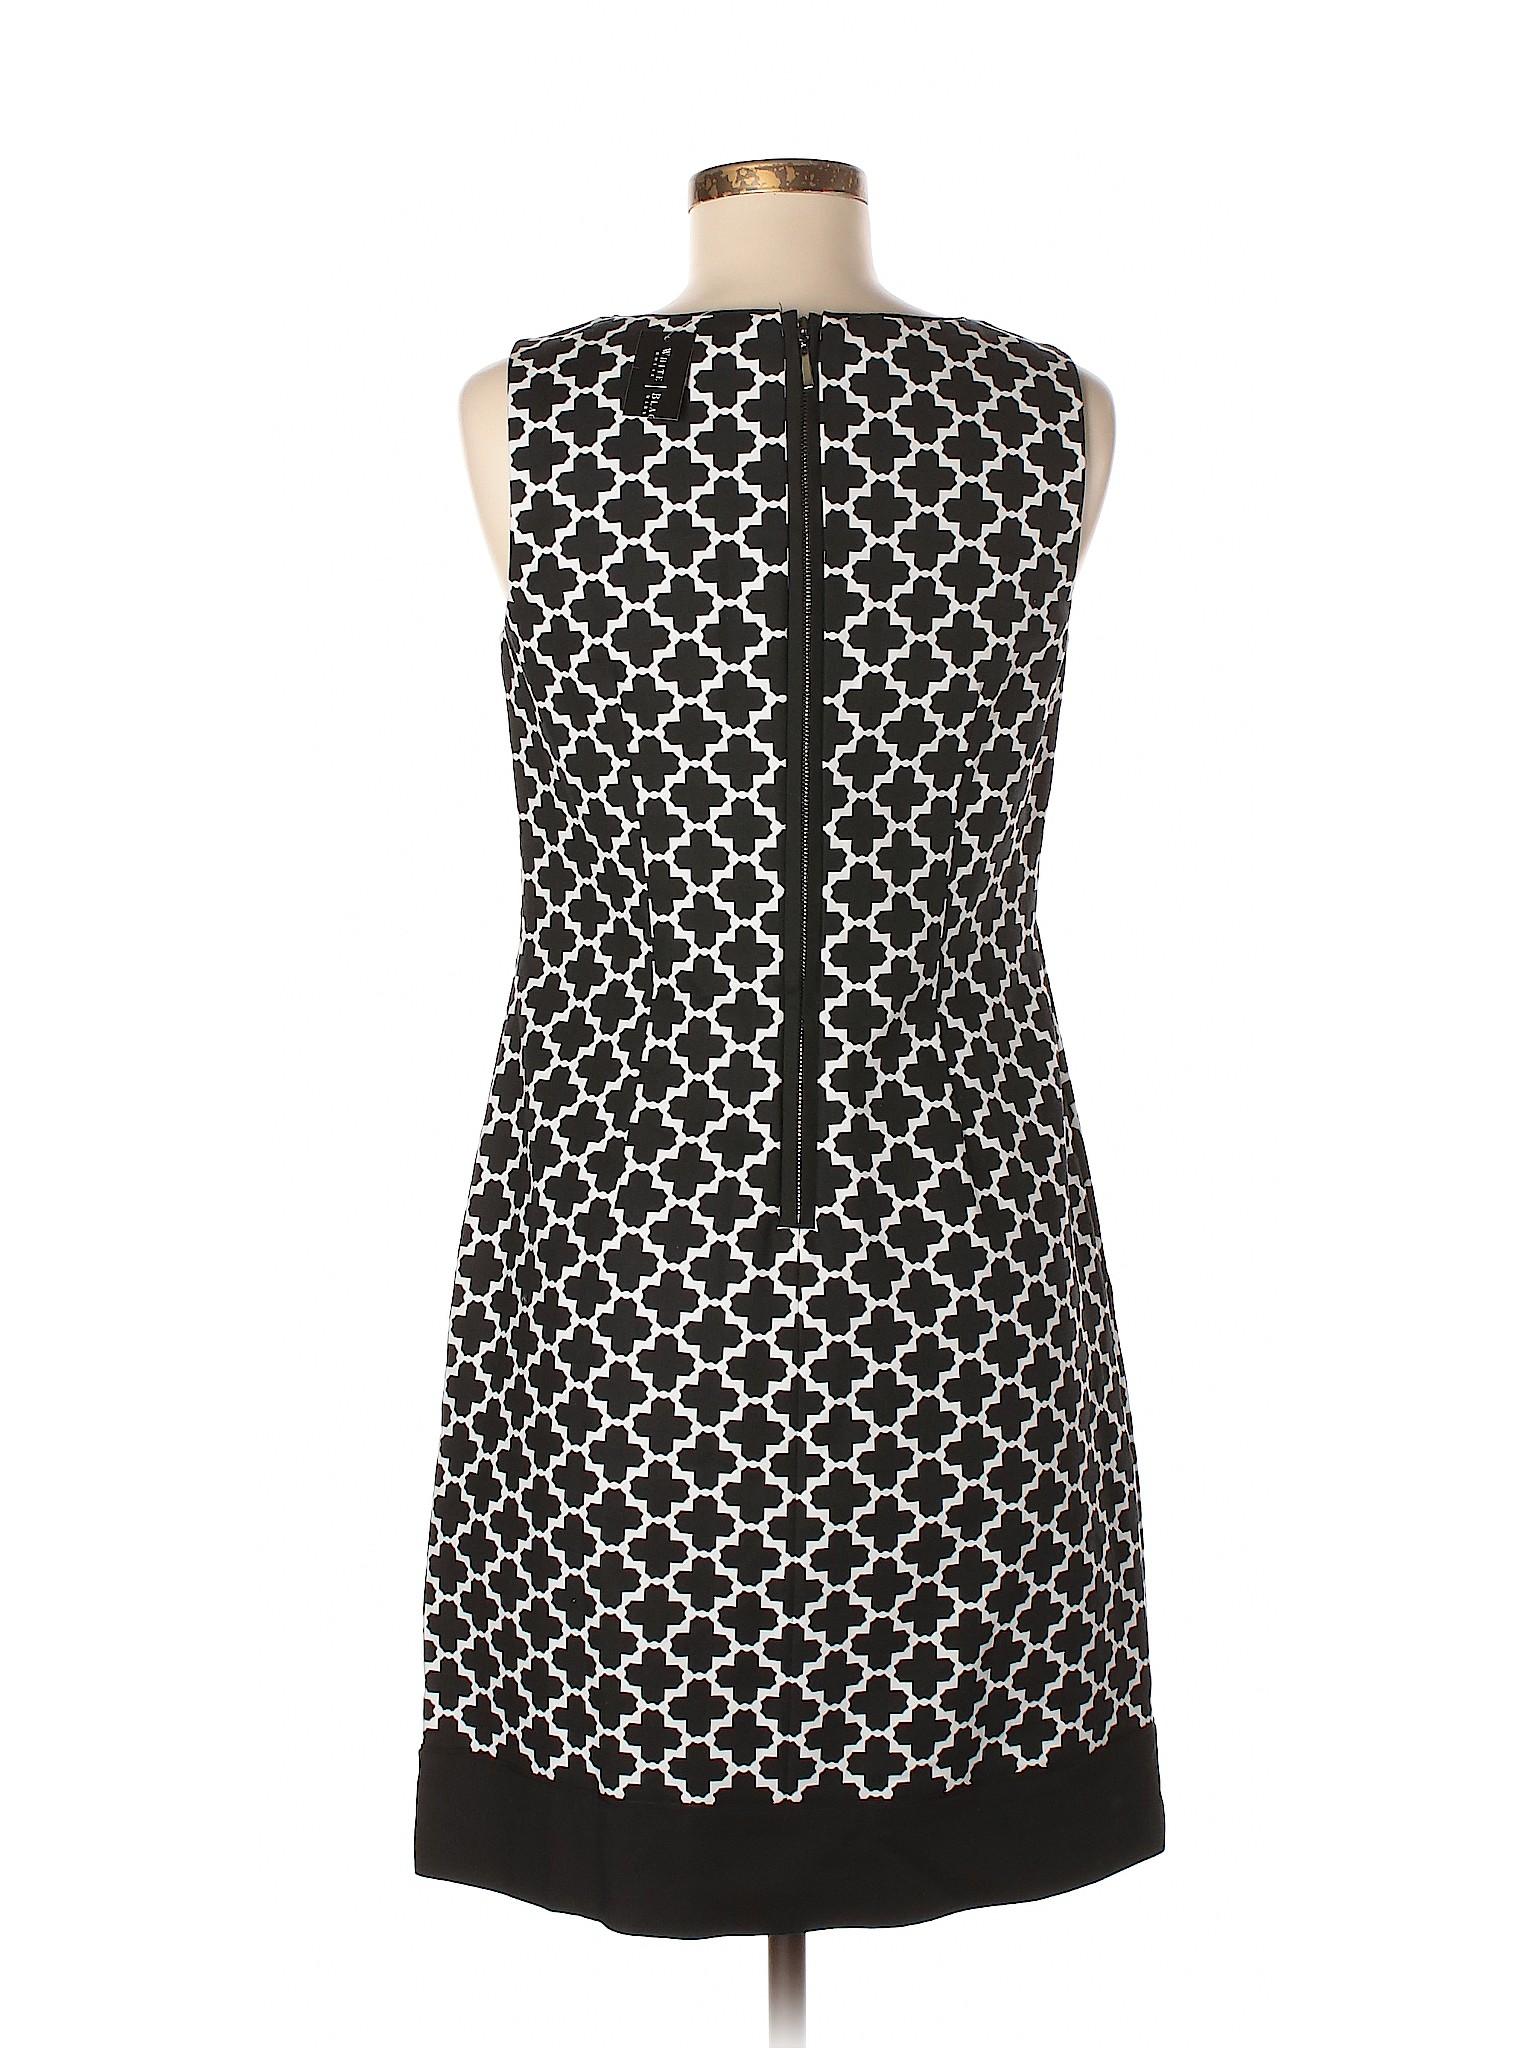 Casual Dress Black House Boutique Market winter White qxwgfHnX0